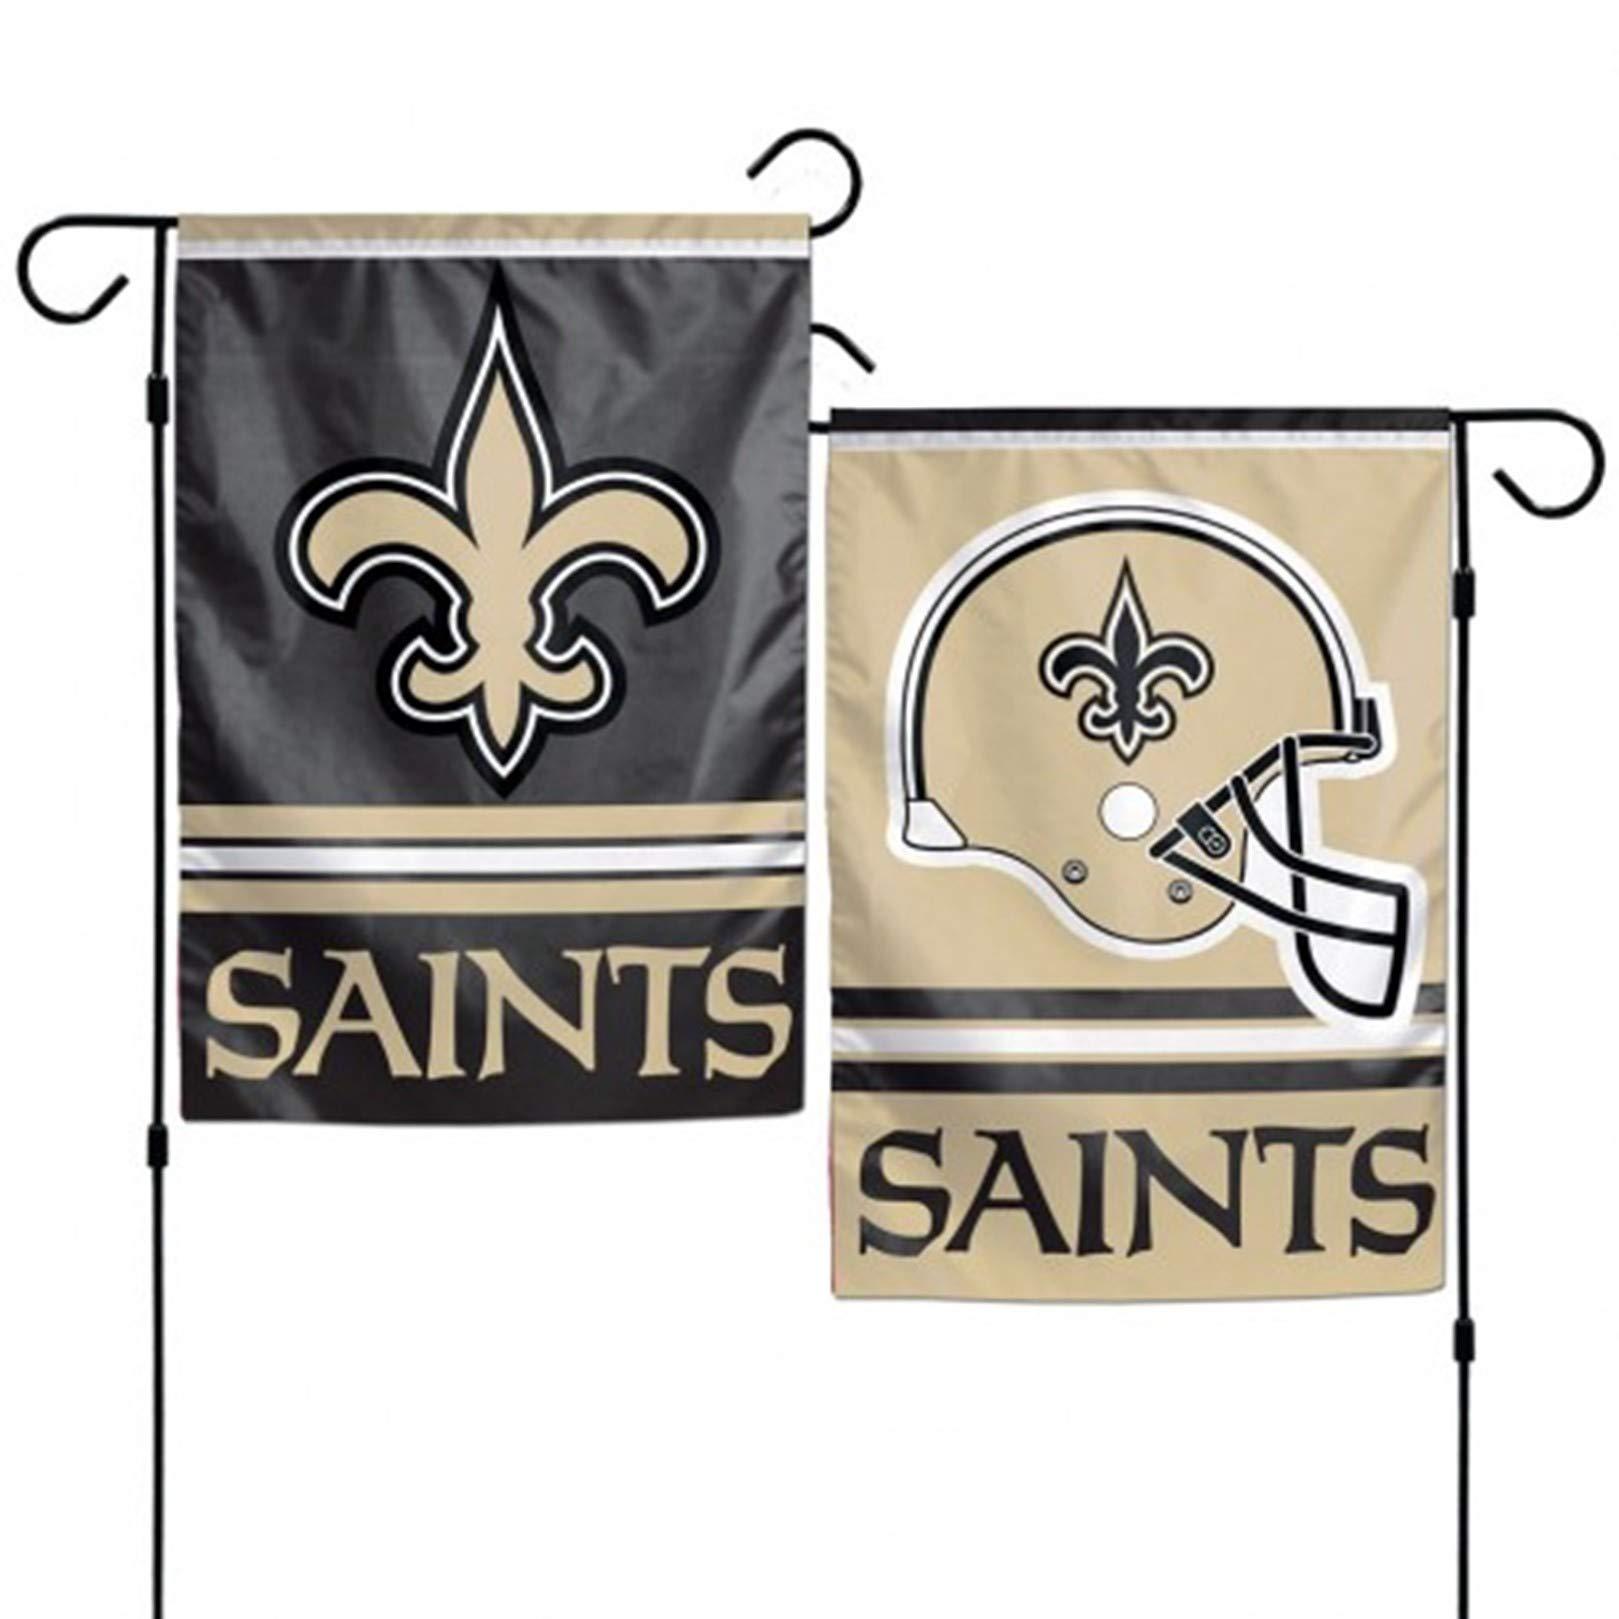 Stockdale New Orleans Saints WC Garden Flag Premium 2-Sided Outdoor House Banner Football